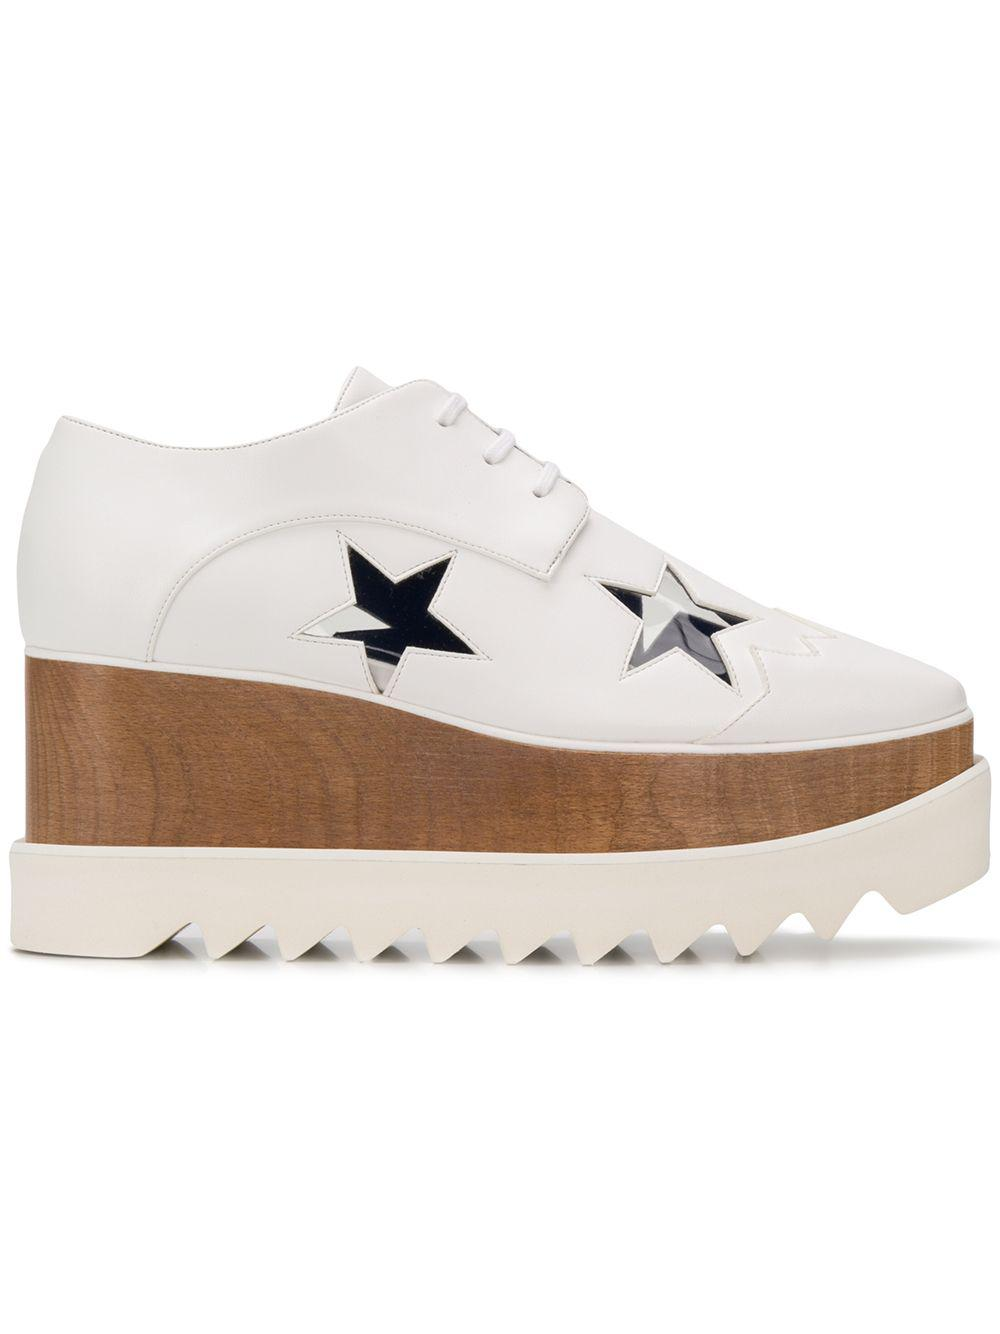 bf4d0e3dd9b6 Lyst - Stella McCartney Elyse Star Sneakers in White